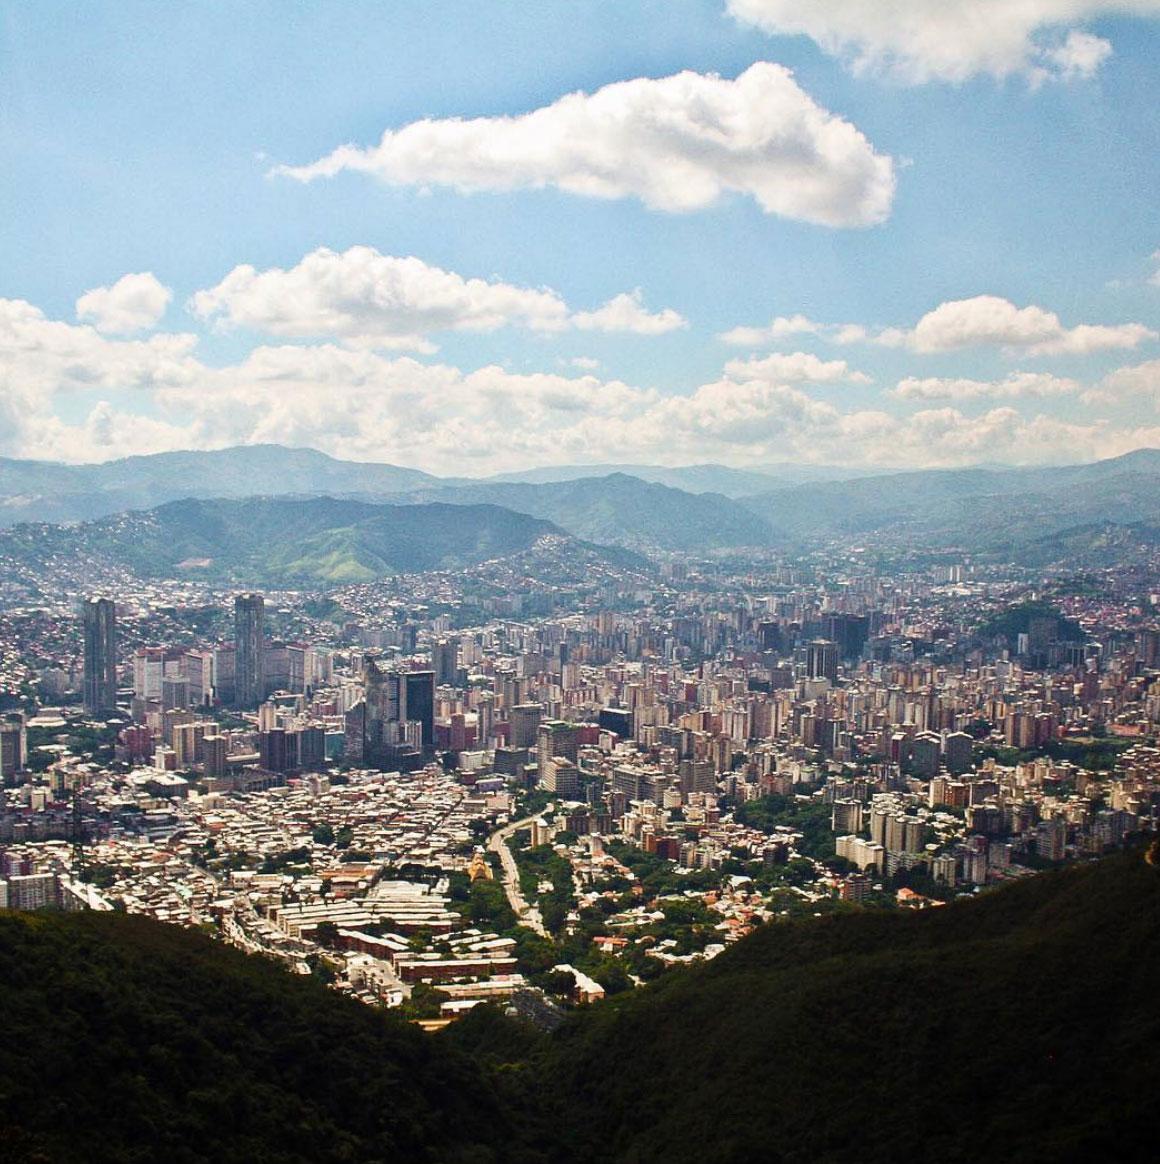 Panoramic view of Caracas from the Avila, Venezuela